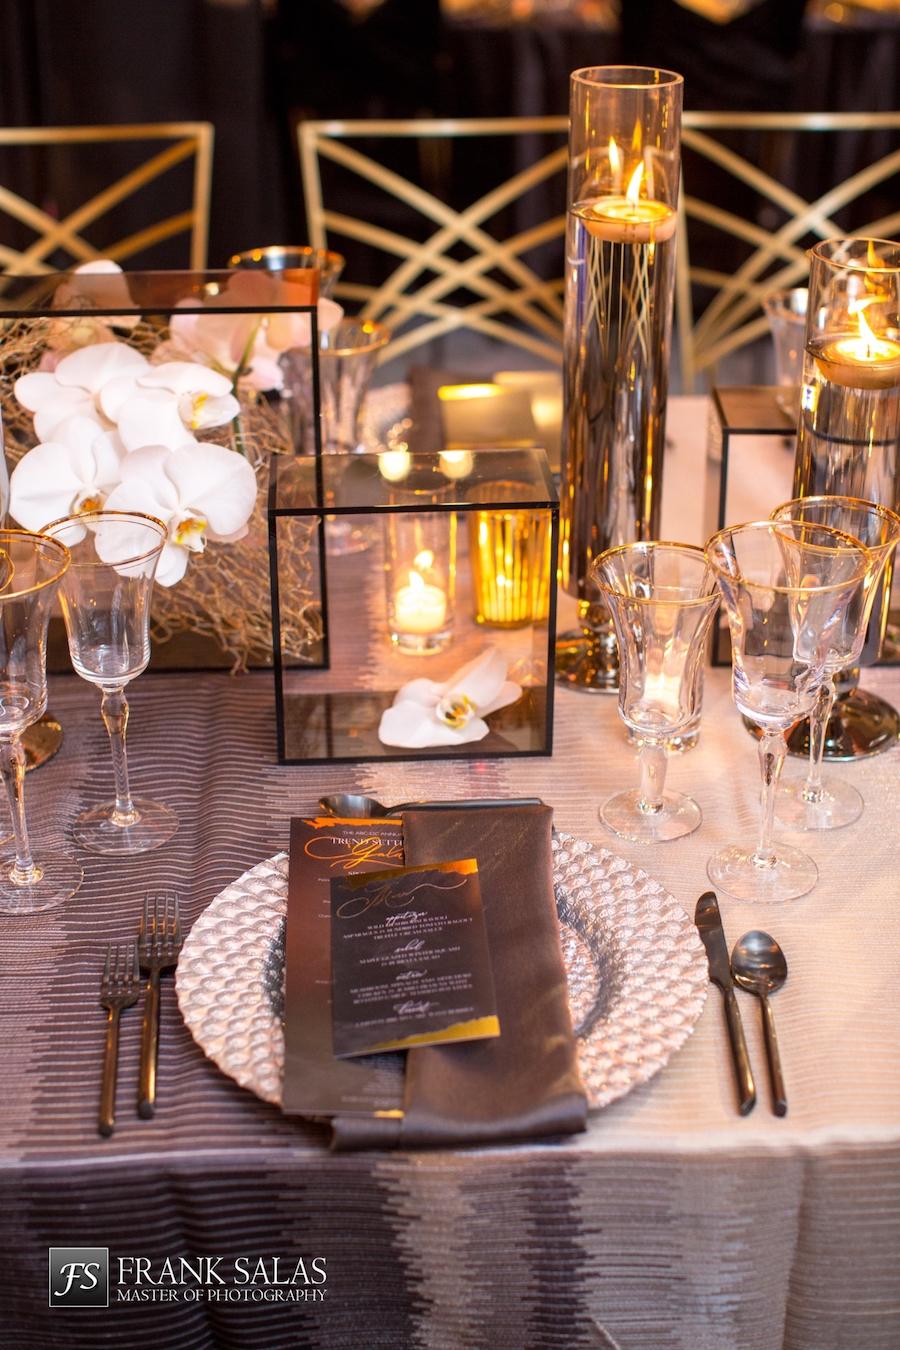 ABC Gala 2017-Shawna-yamamoto-kelsey-events-pasea-hotel-platinum-weddings-by-Kerrie-Frank-Salas-2.jpg